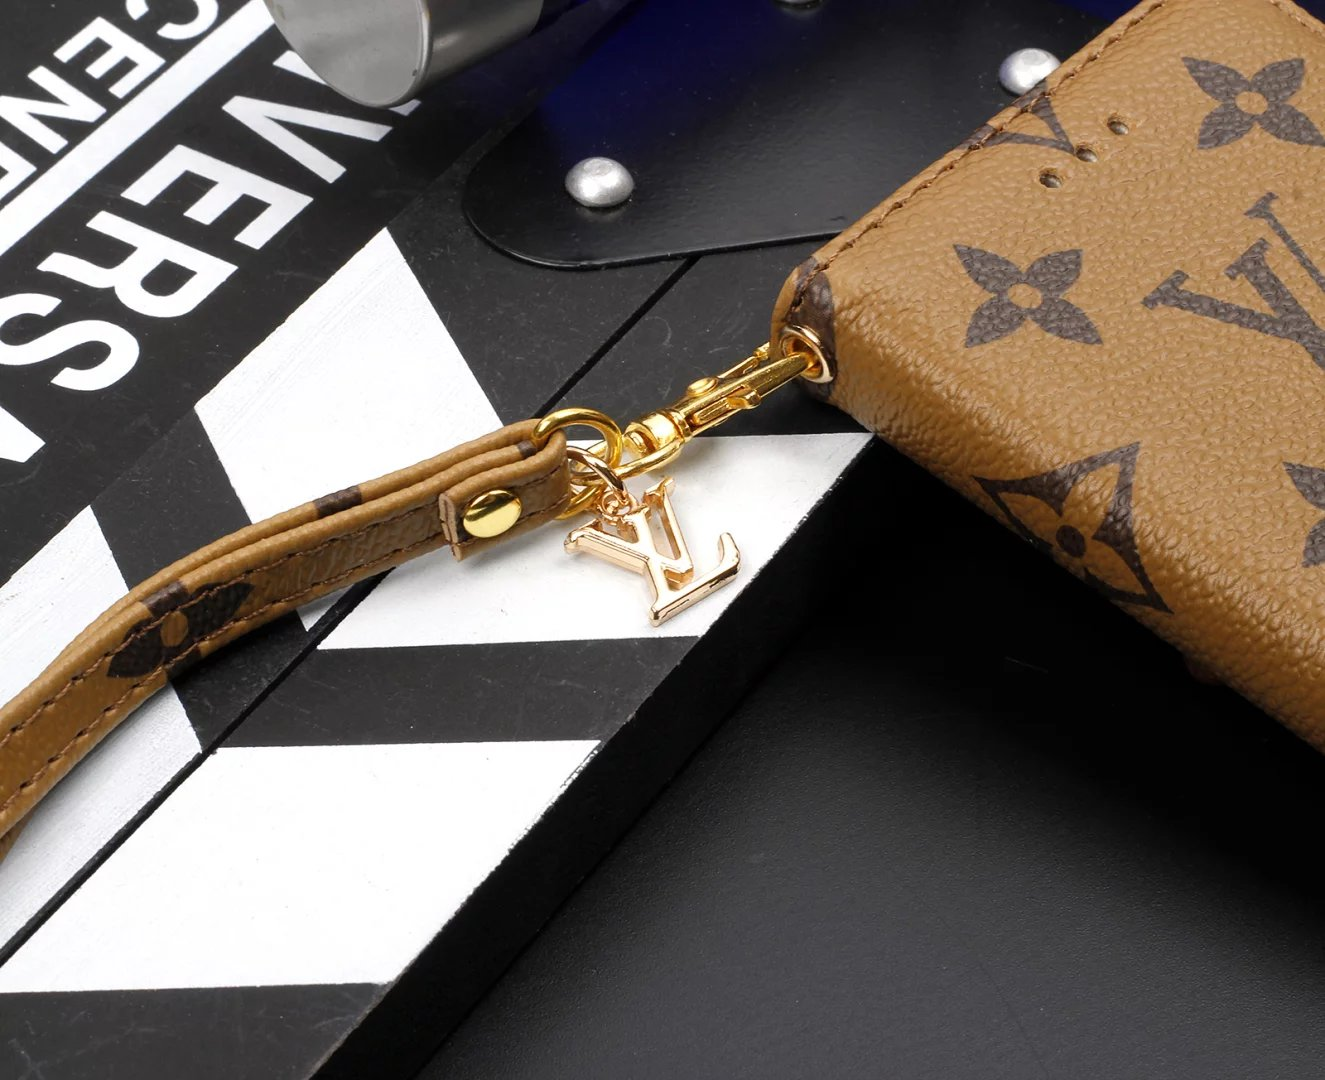 edle iphone hüllen iphone handyhülle selbst gestalten Louis Vuitton iphone 8 hüllen handyhülle s3 mini 8lbst gestalten iphone 3 schutzhülle iphone silikonhülle iphone 8 hülle 8lber gestalten günstig handyhülle mit eigenem foto ipad hülle 8lbst gestalten